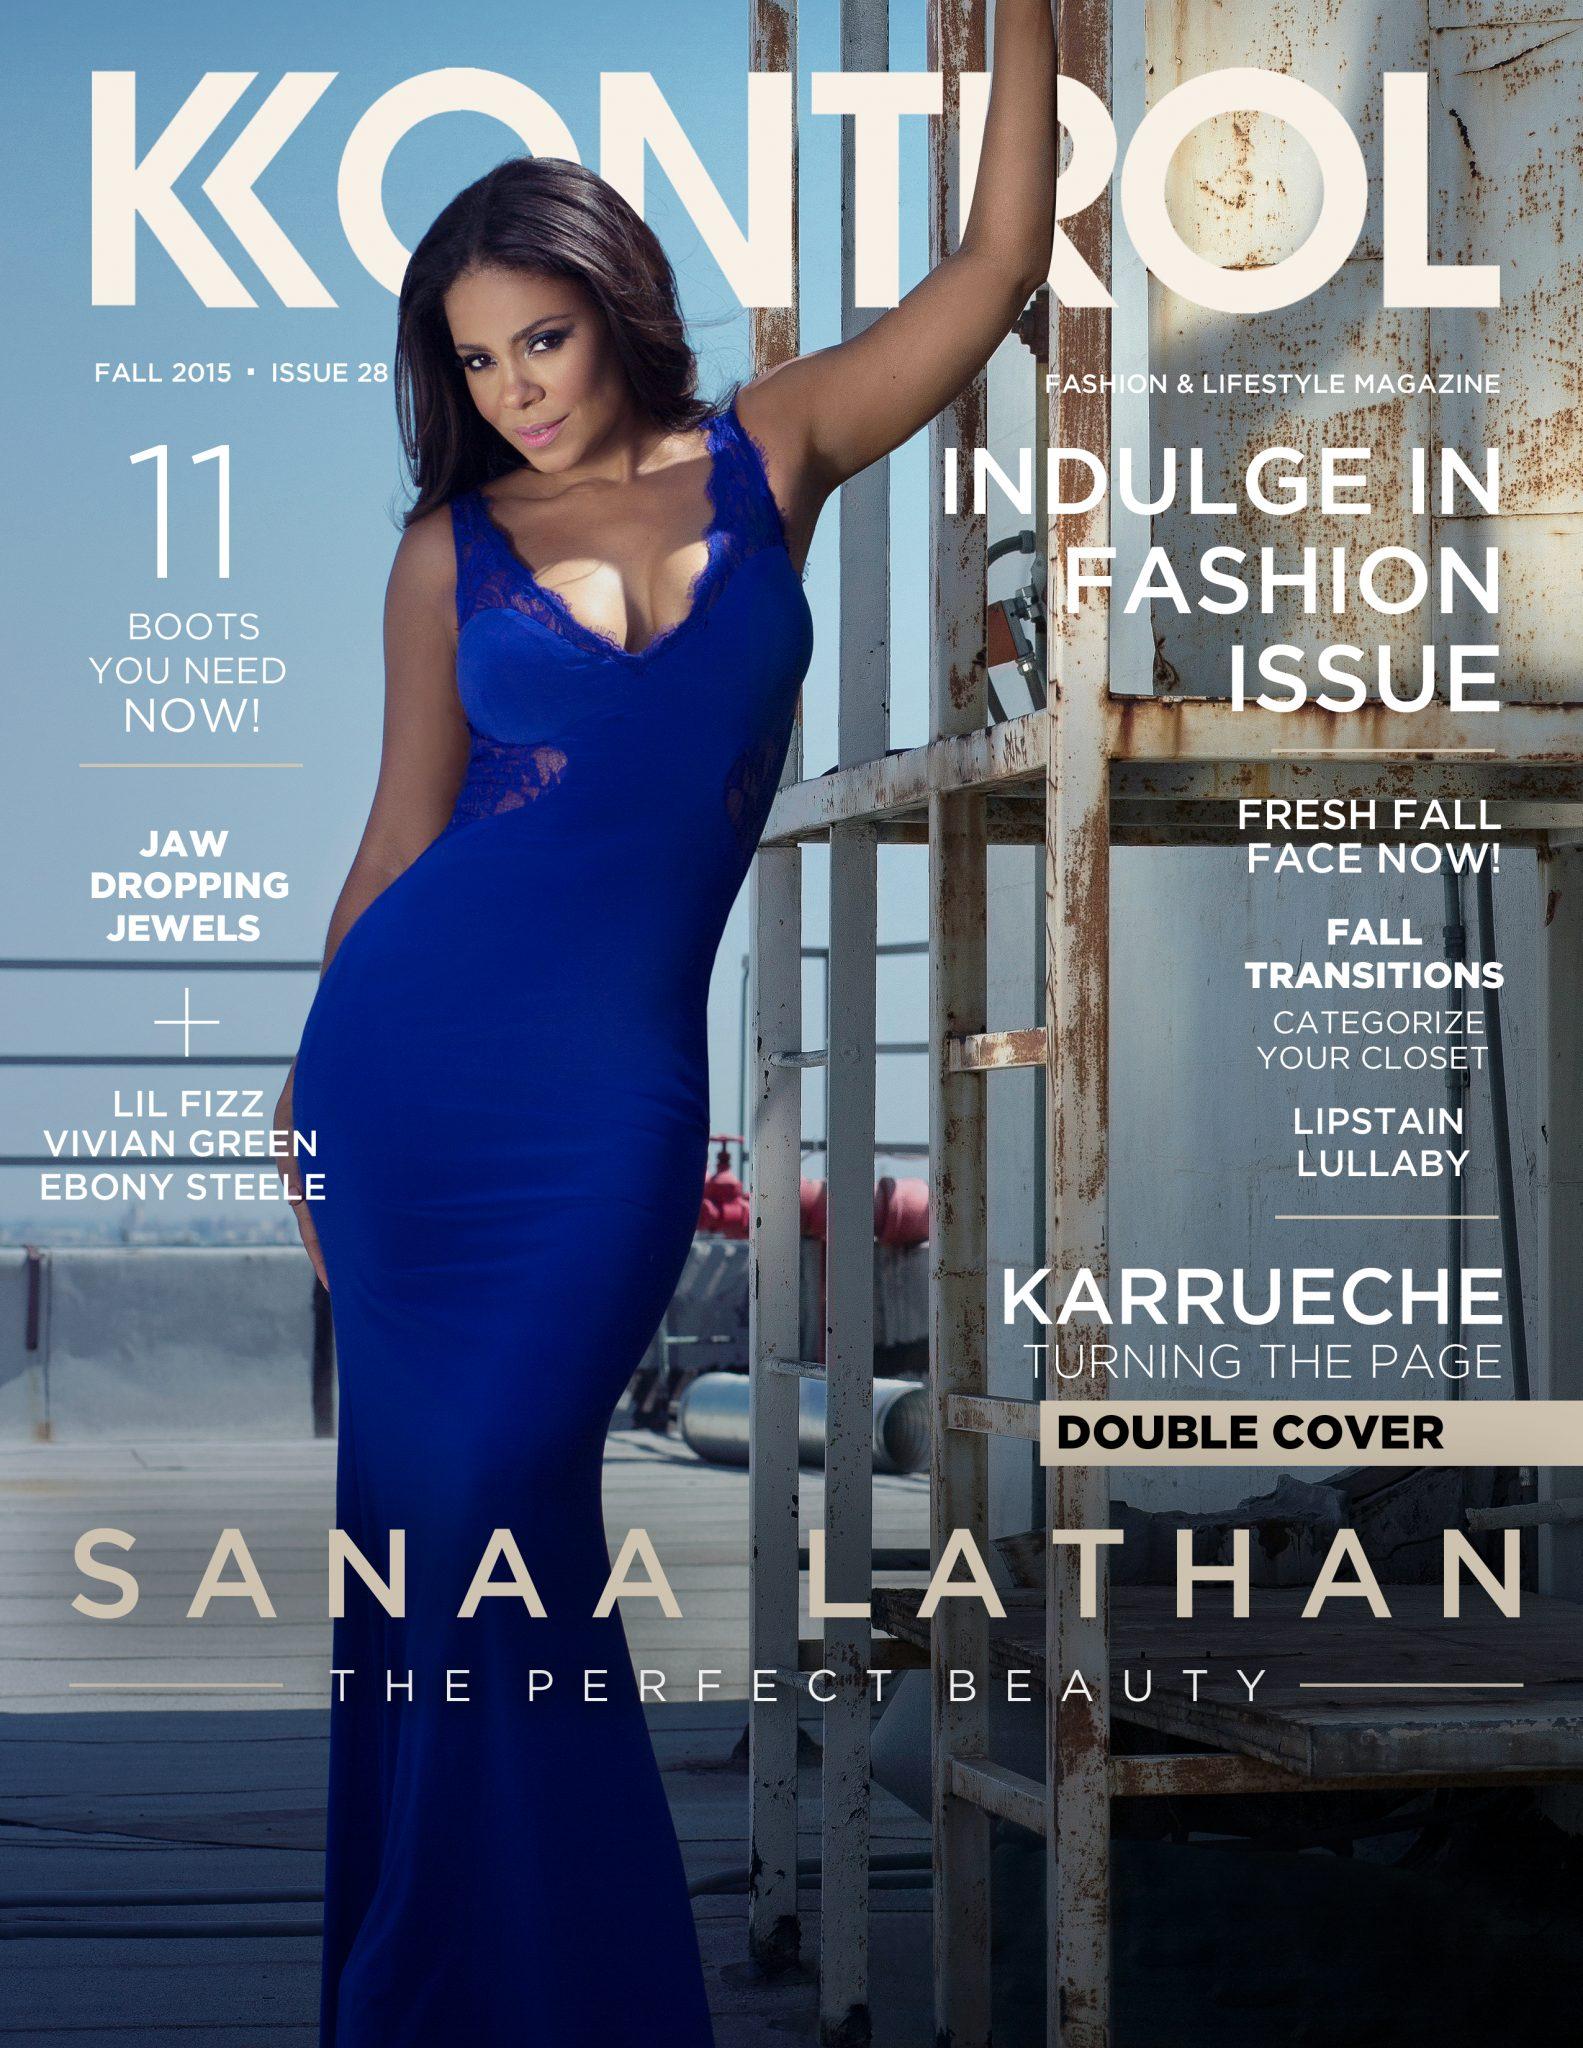 Sanaa Lathan & Karrueche Tran For Kontrol Magazine